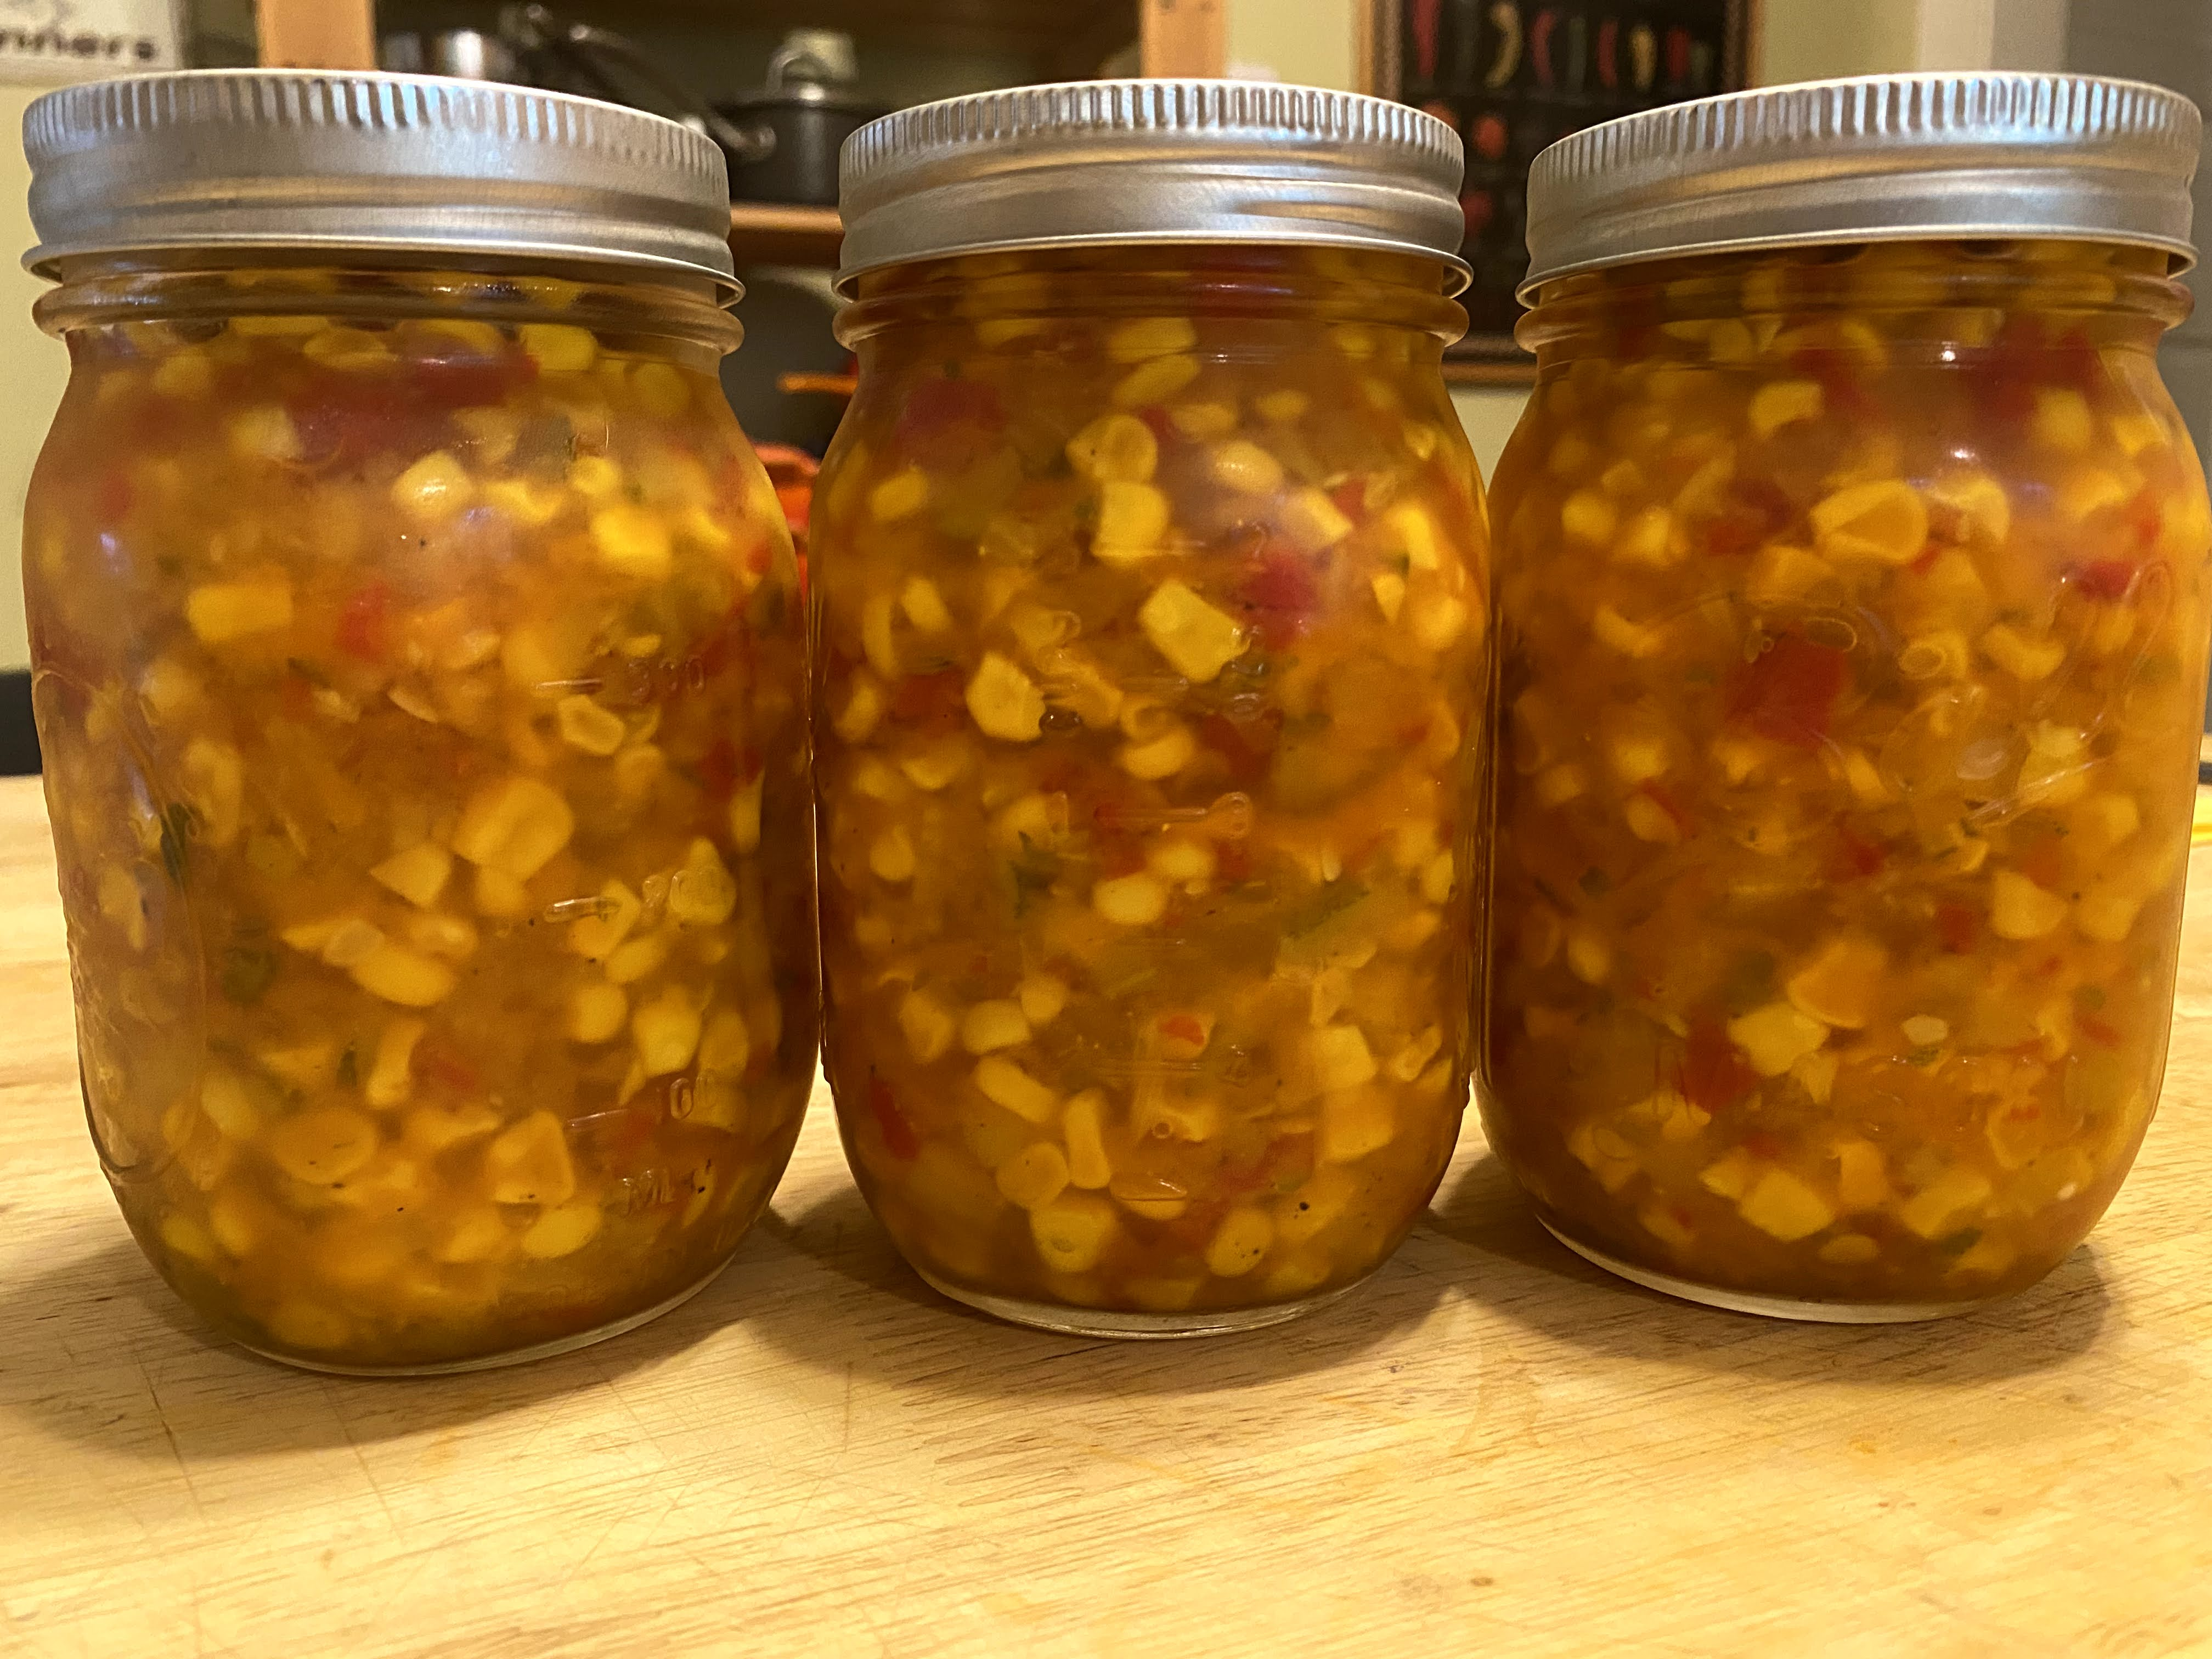 Refrigerator Pickled Corn Relish